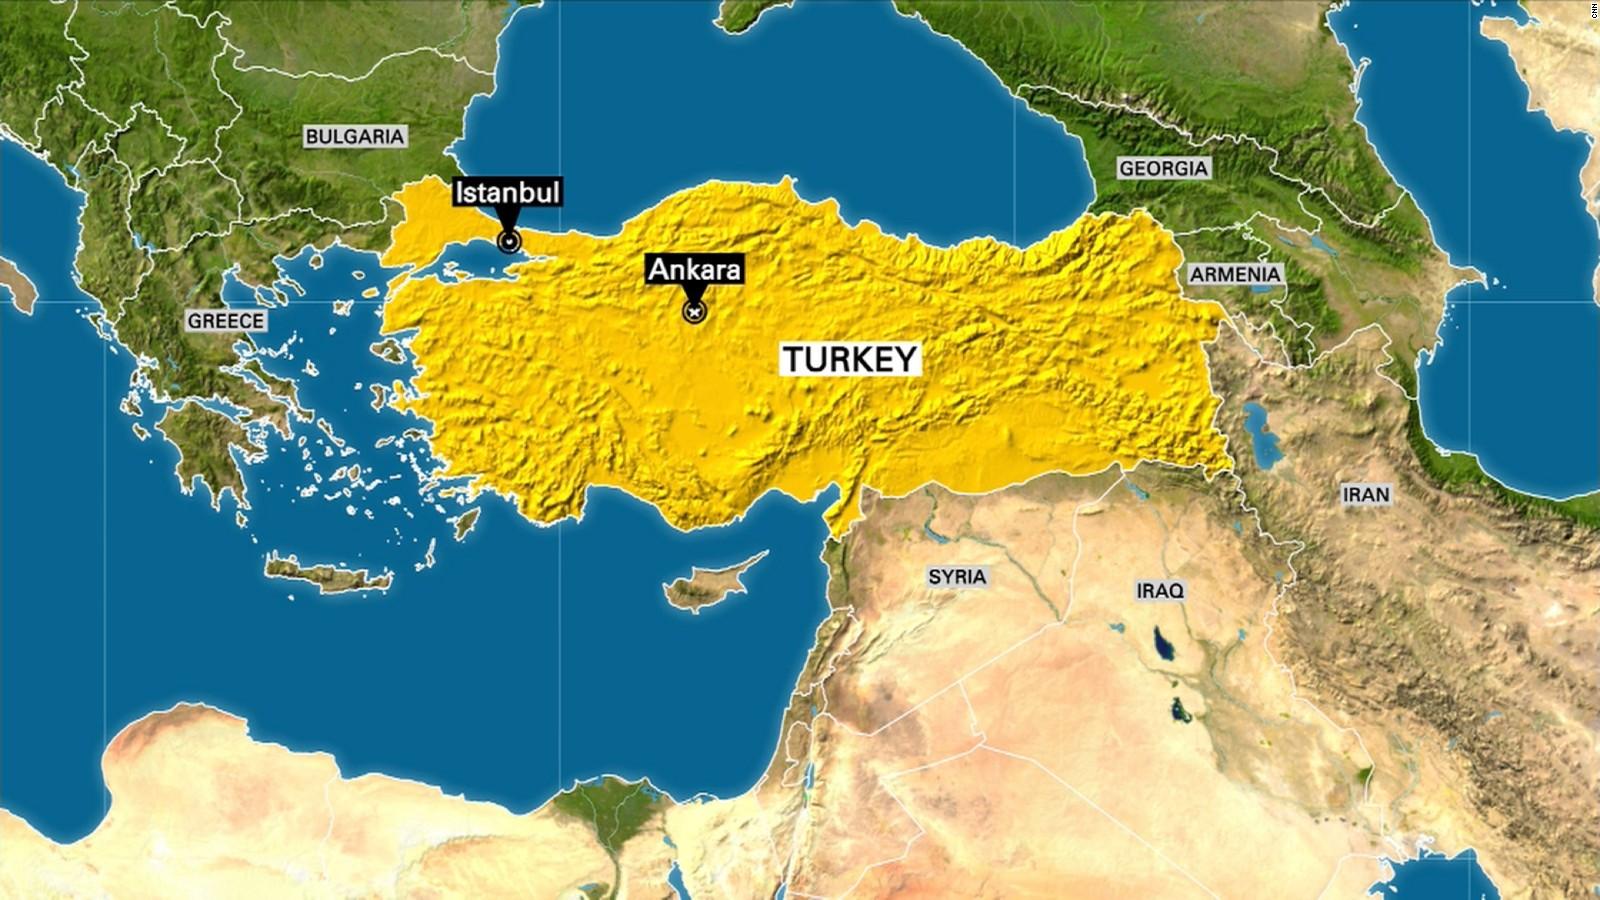 Turkish PM Military Taking Illegal Action CNN Video - Turkey map